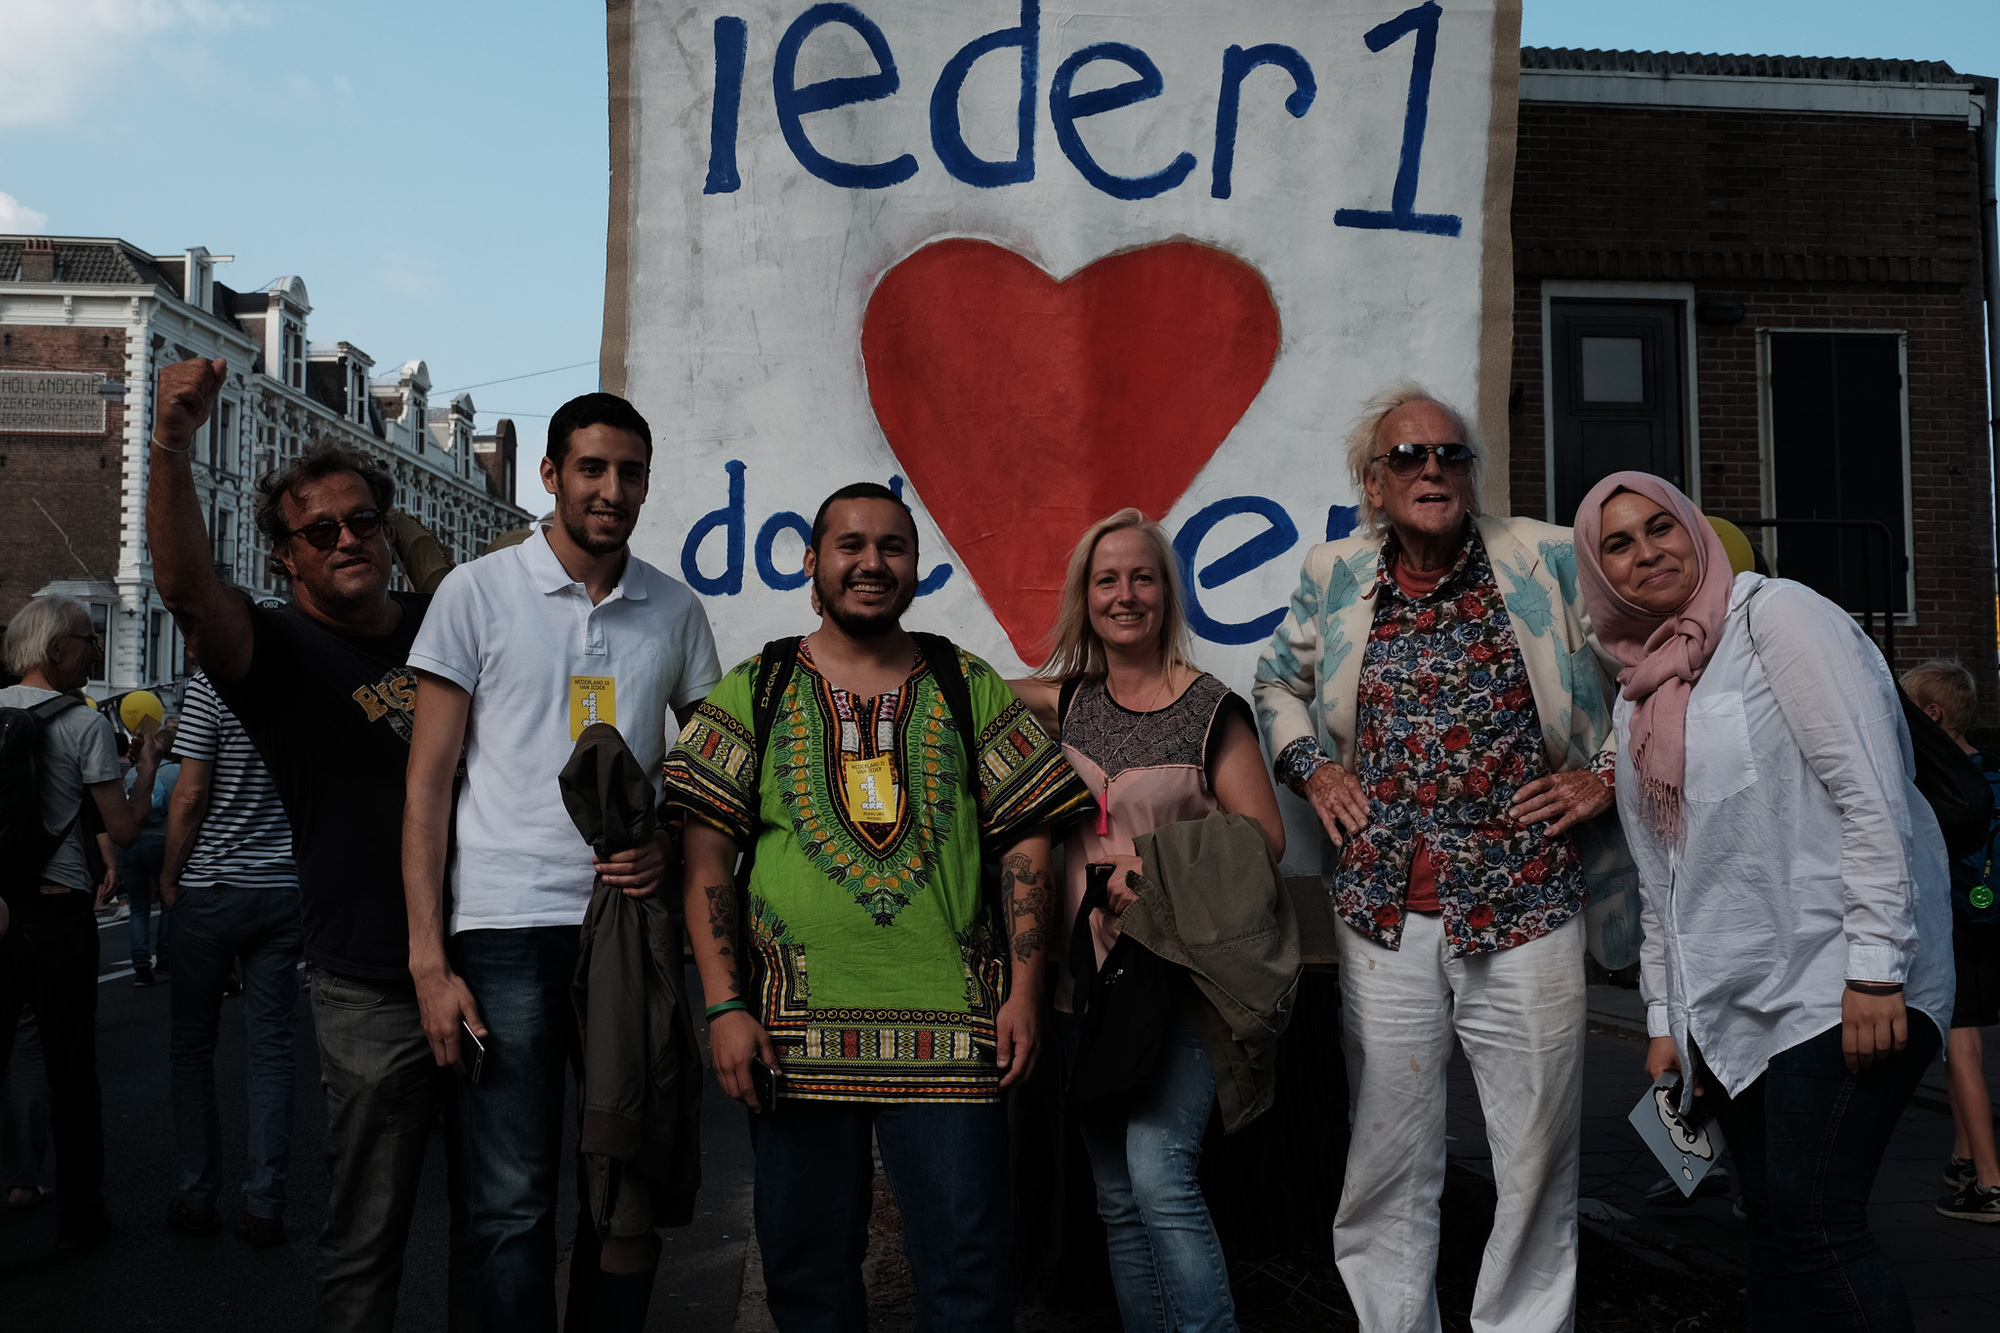 Citinerary Amsterdam Ieder1